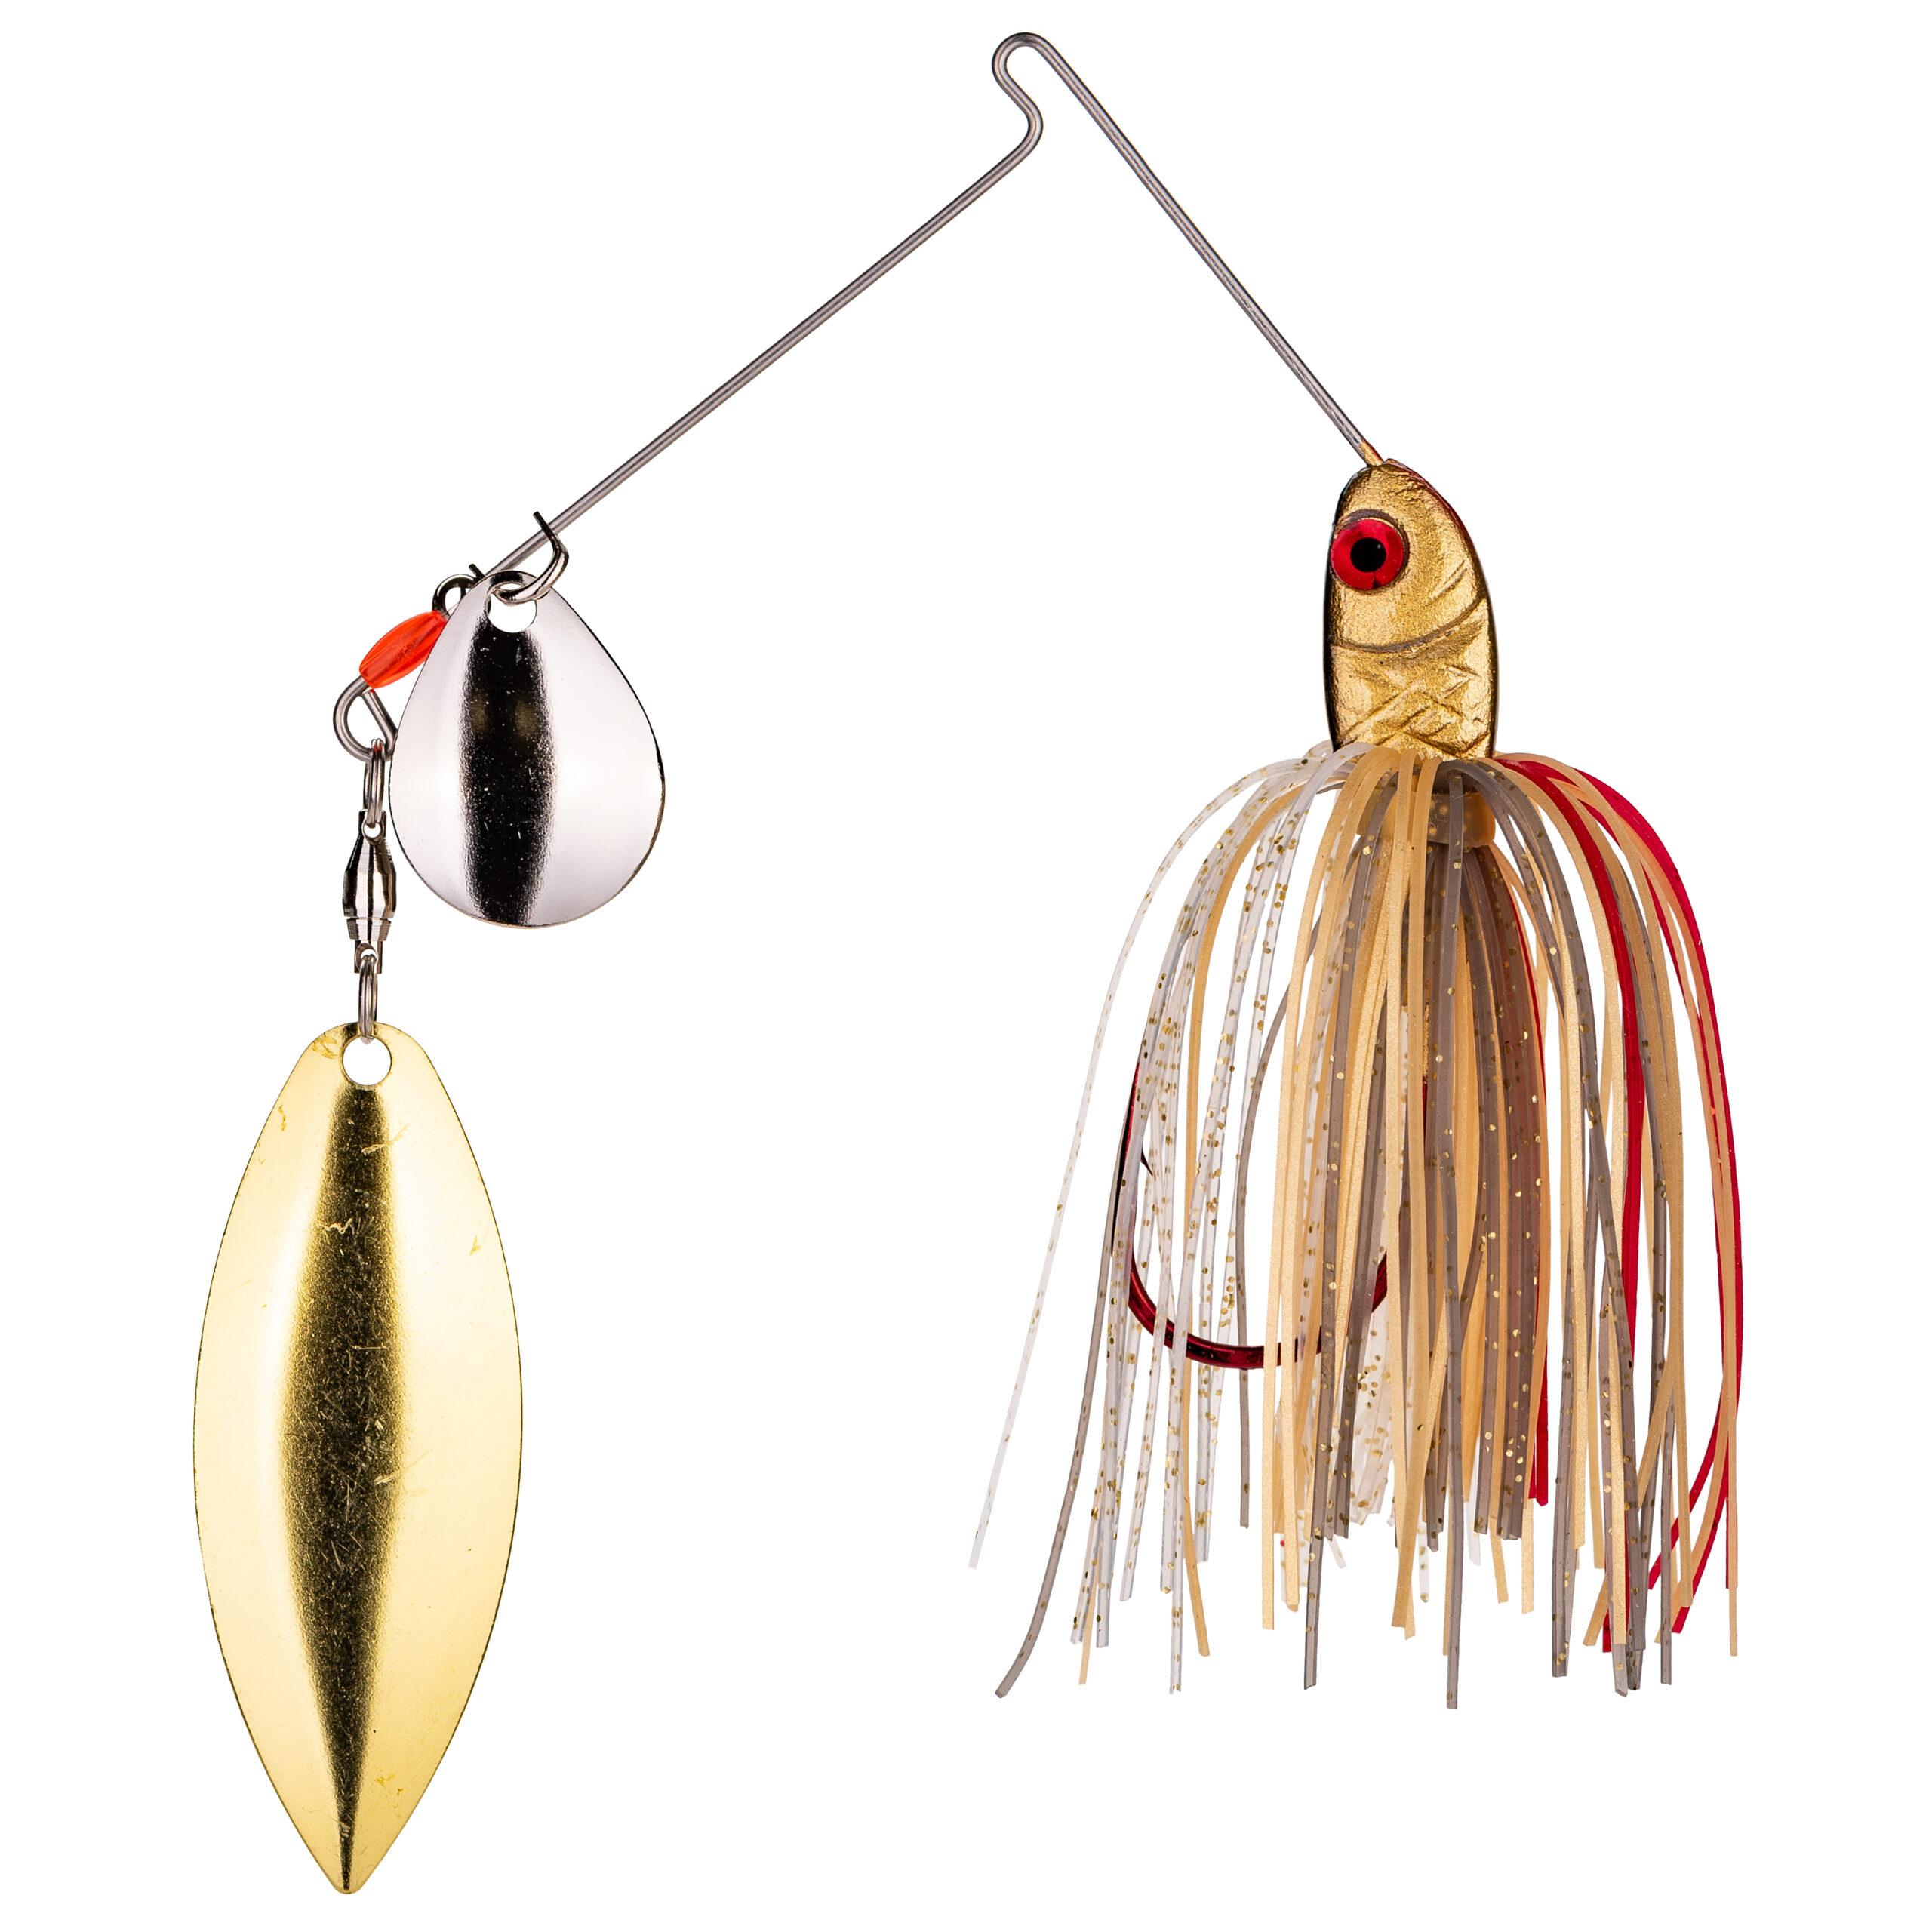 Strike King Lures – Spinnerbaits – Colorado Willow - 3/8oz - BB38CW-315SG - Gold Shiner